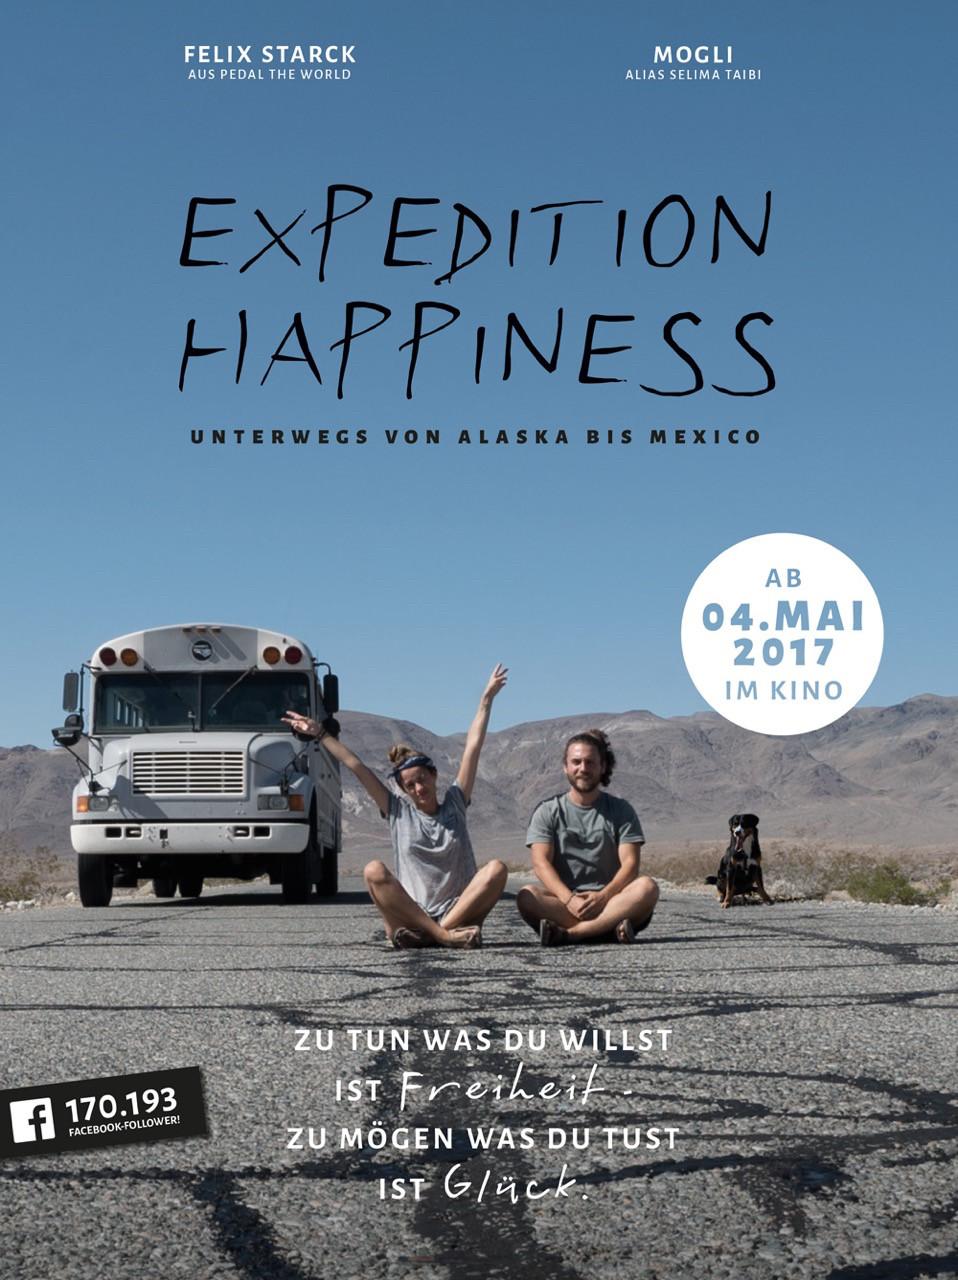 https://www.imdb.com/title/tt6688136/ IMDb image -Expedition Happiness